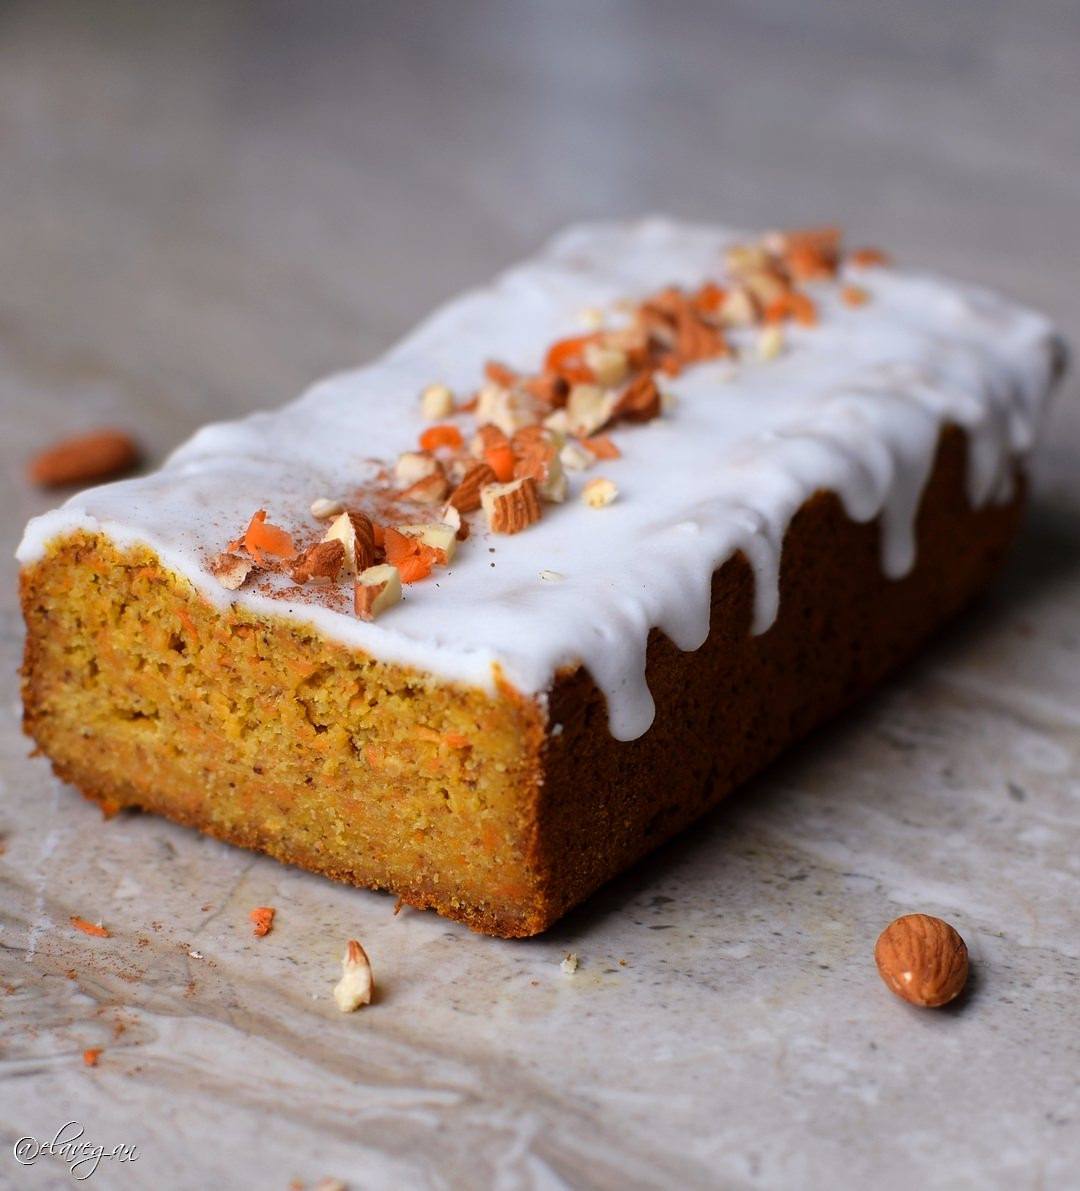 Healthy Vegan Carrot Cake  Vegan gluten free carrot cake recipe